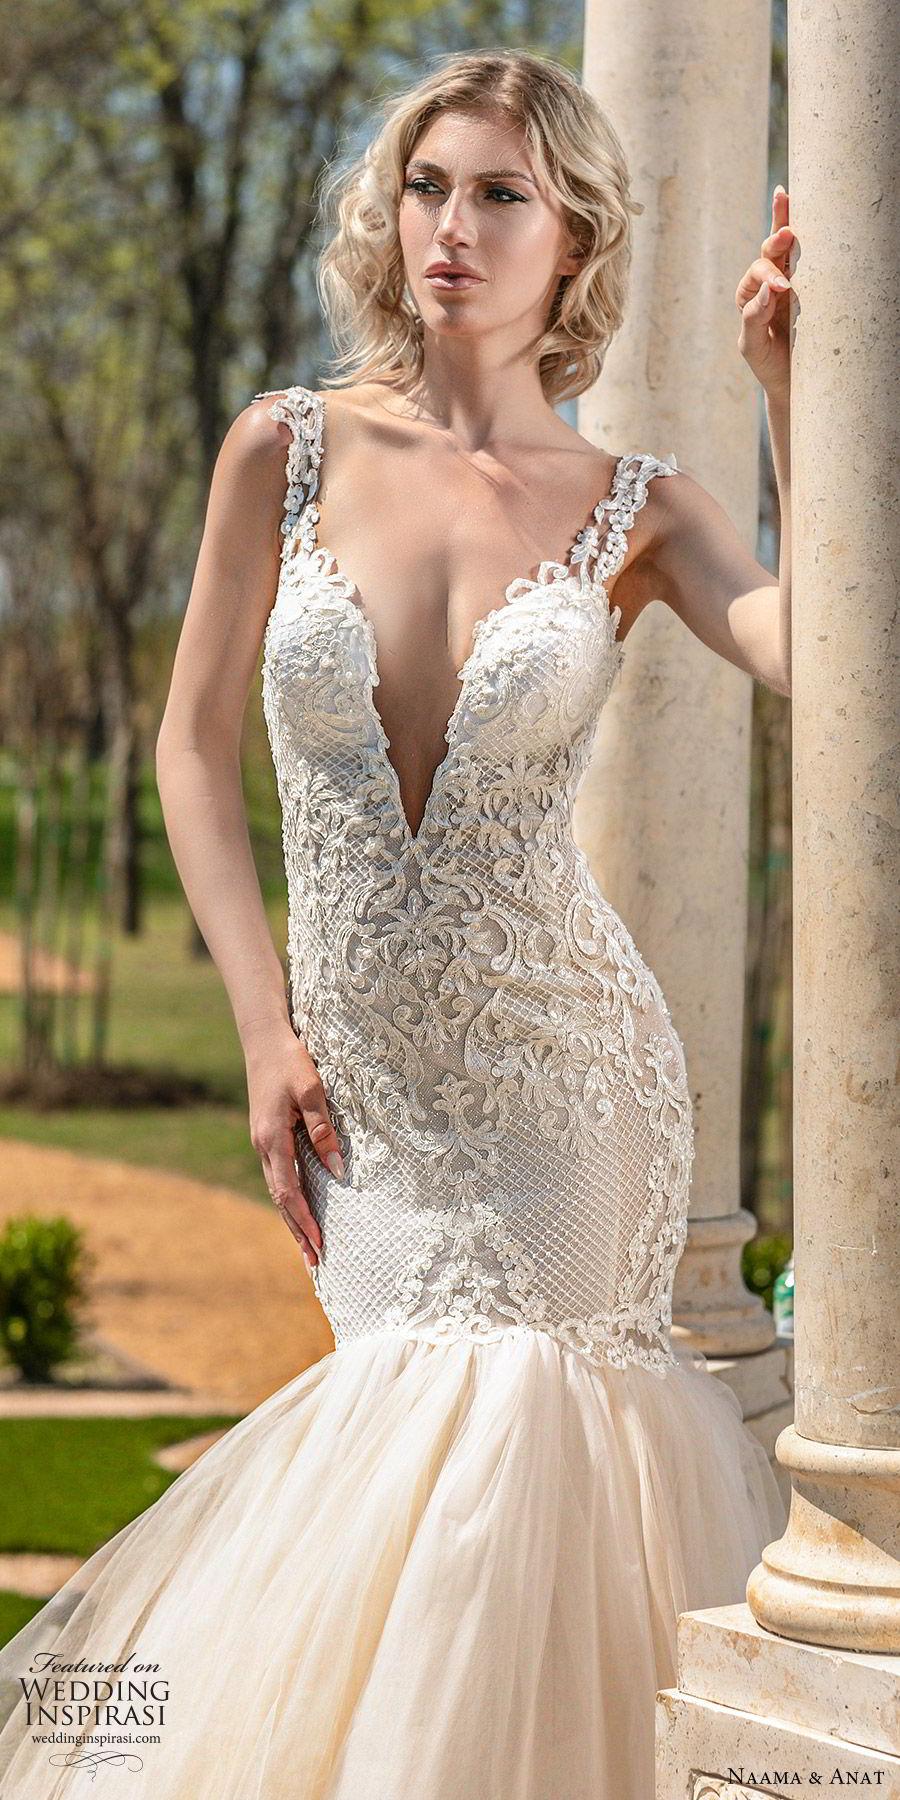 naama anat spring 2020 bridal cap sleeves split sweetheart neckline lace bodice ruffle skirt mermaid wedding dress (2) romantic chapel train open back blush zv